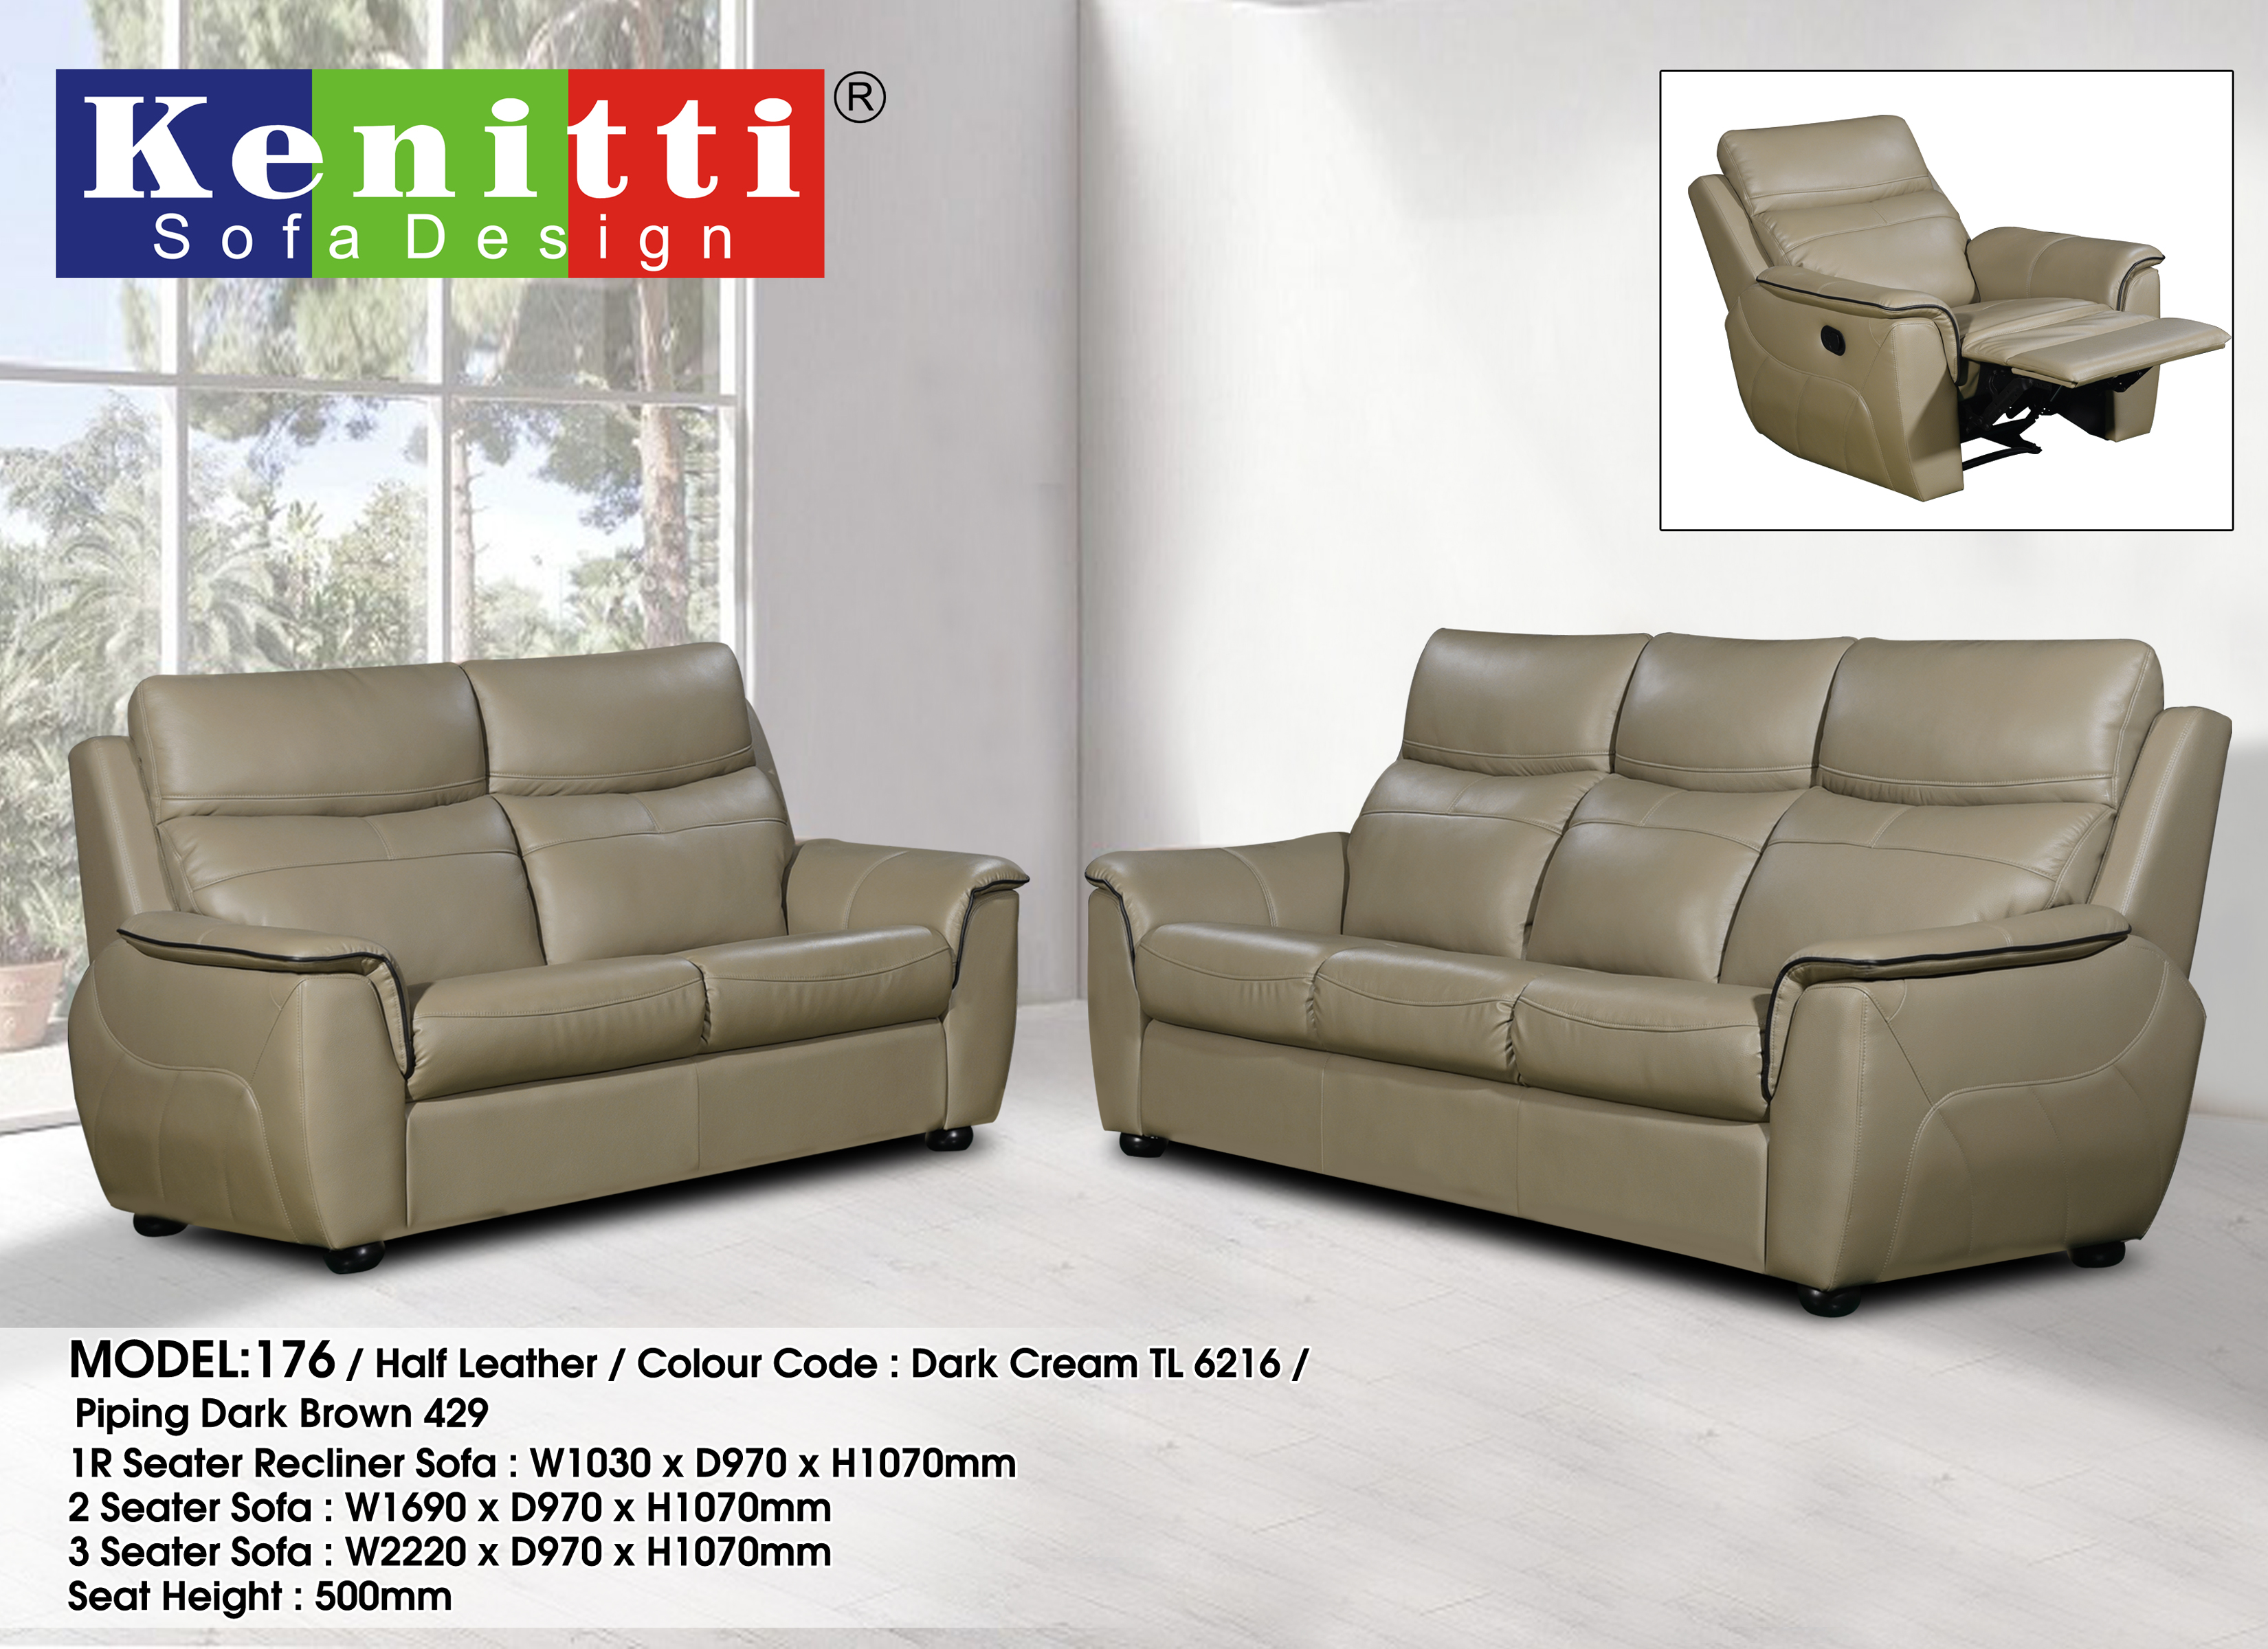 Model - 176 - 1R + 2 + 3 Half Leather